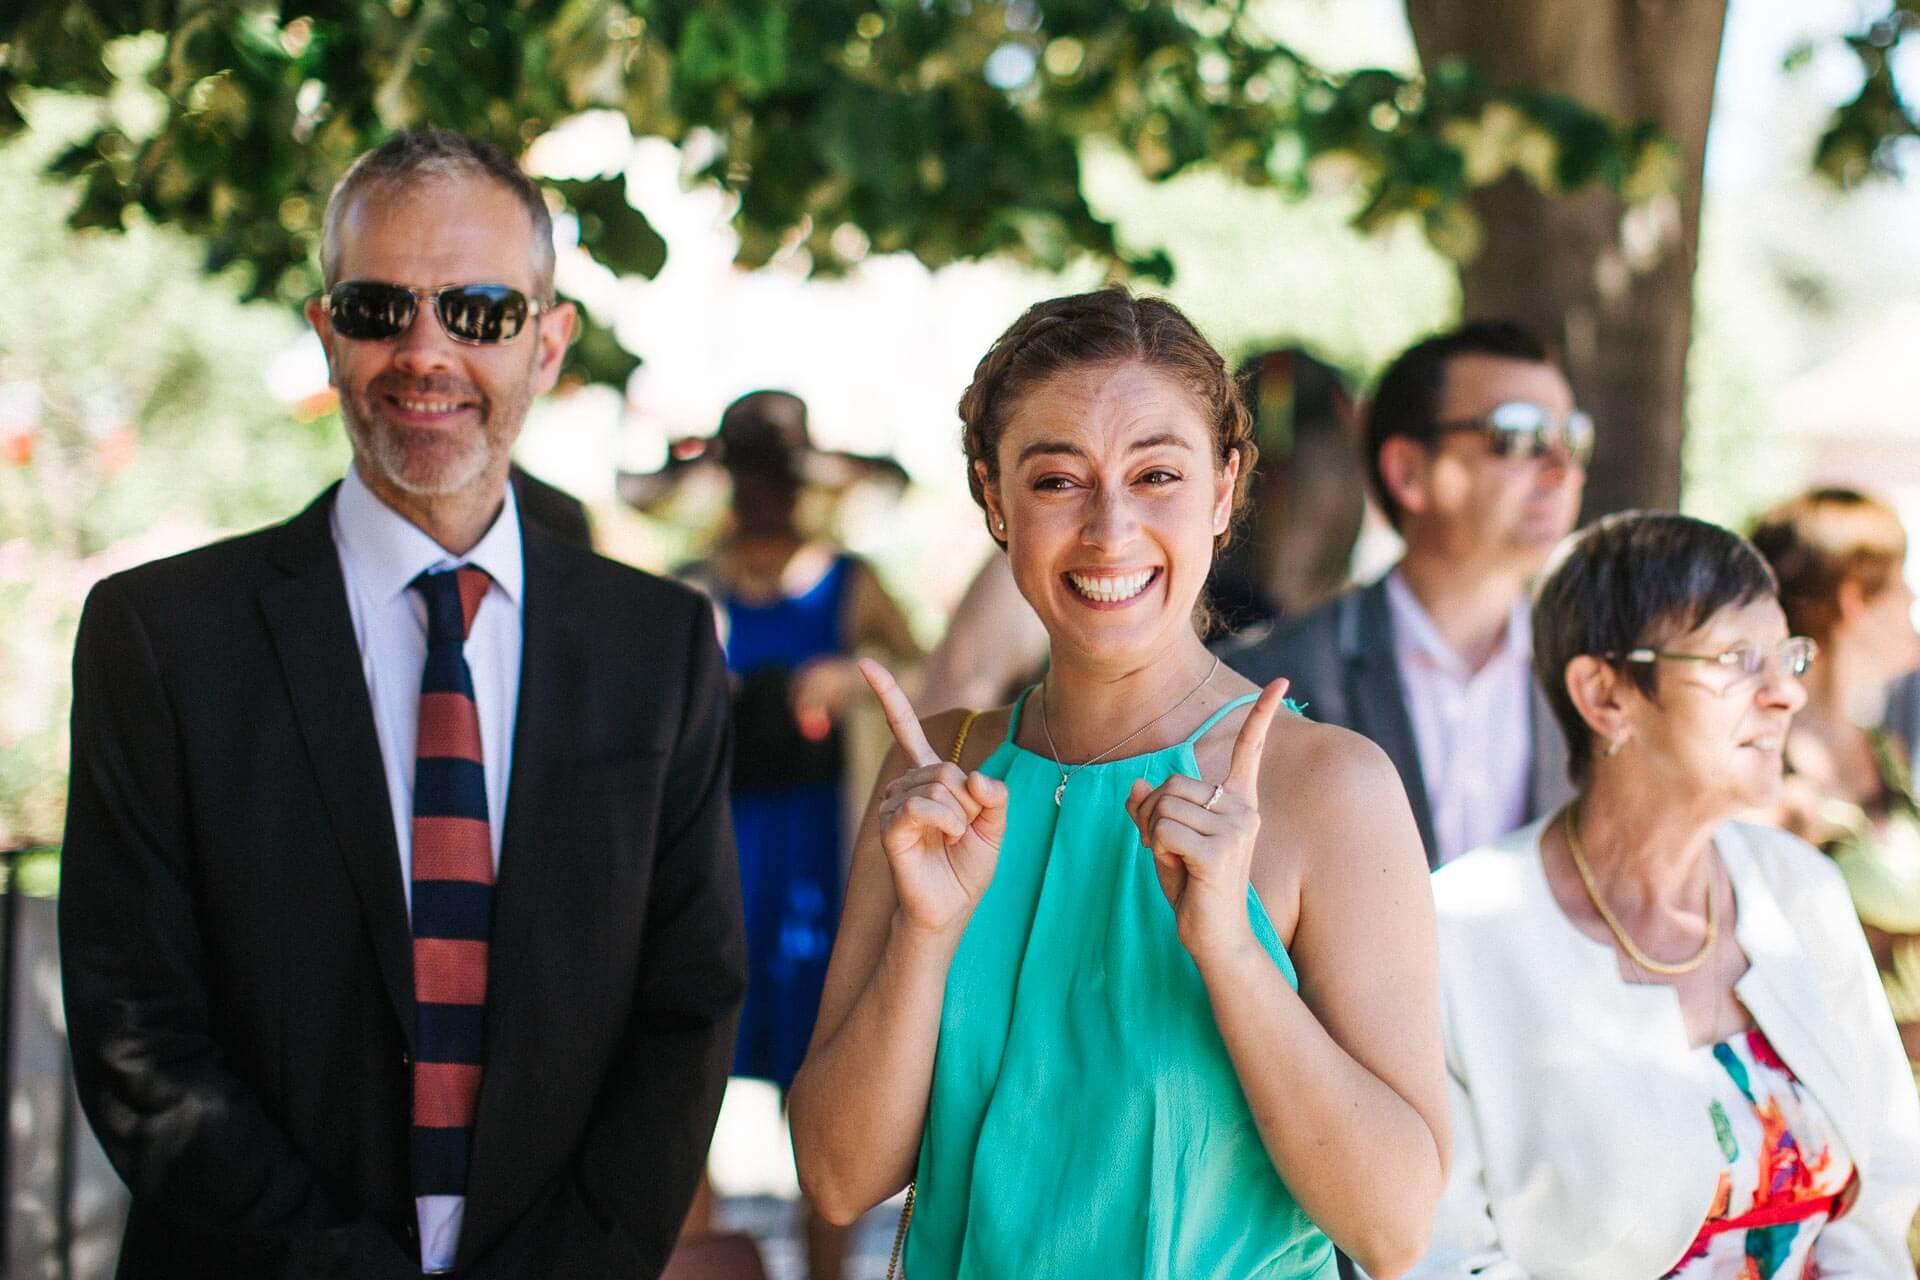 photographe-mariage-aix-en-provence-stephanie-jerome-5